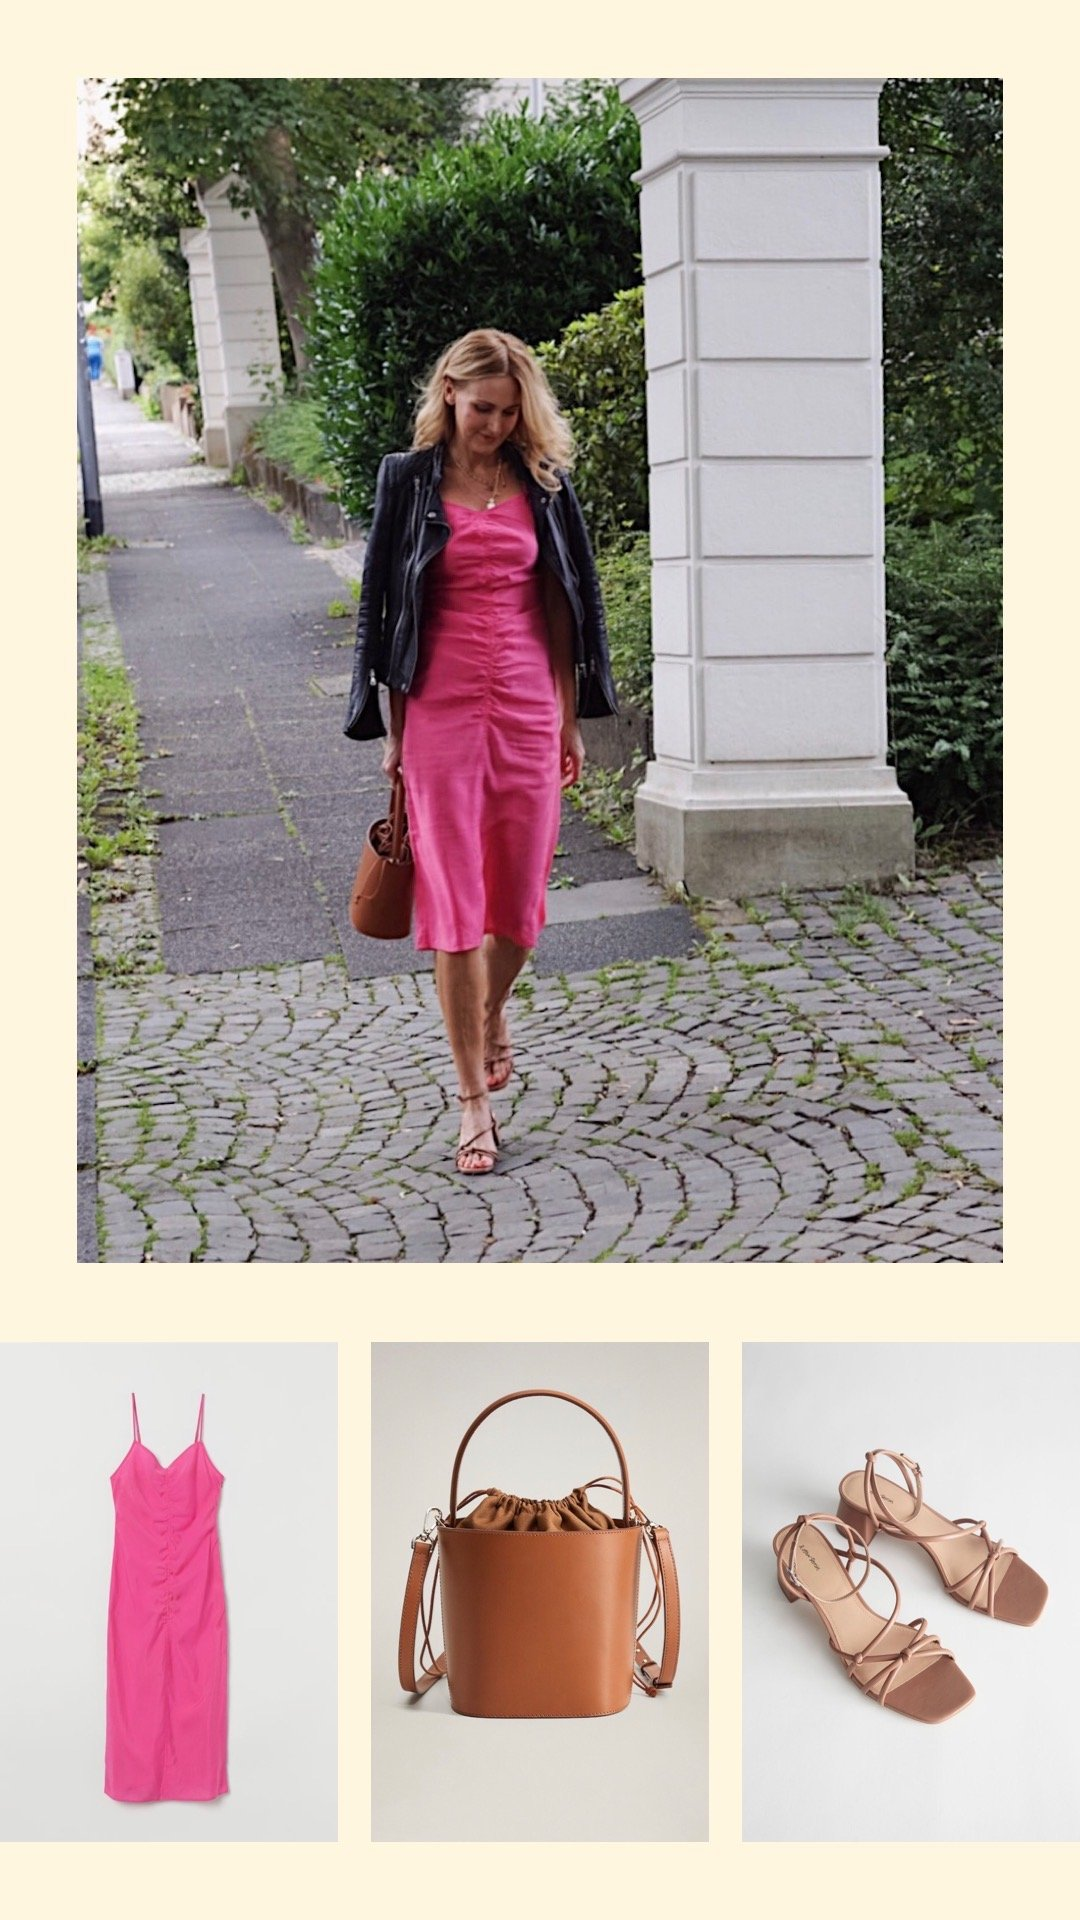 Nowshine-ü-40-blog-ue-40-blog-ü-30-blog-ue-30-blog-fashionblog-Outfit-to-Copy